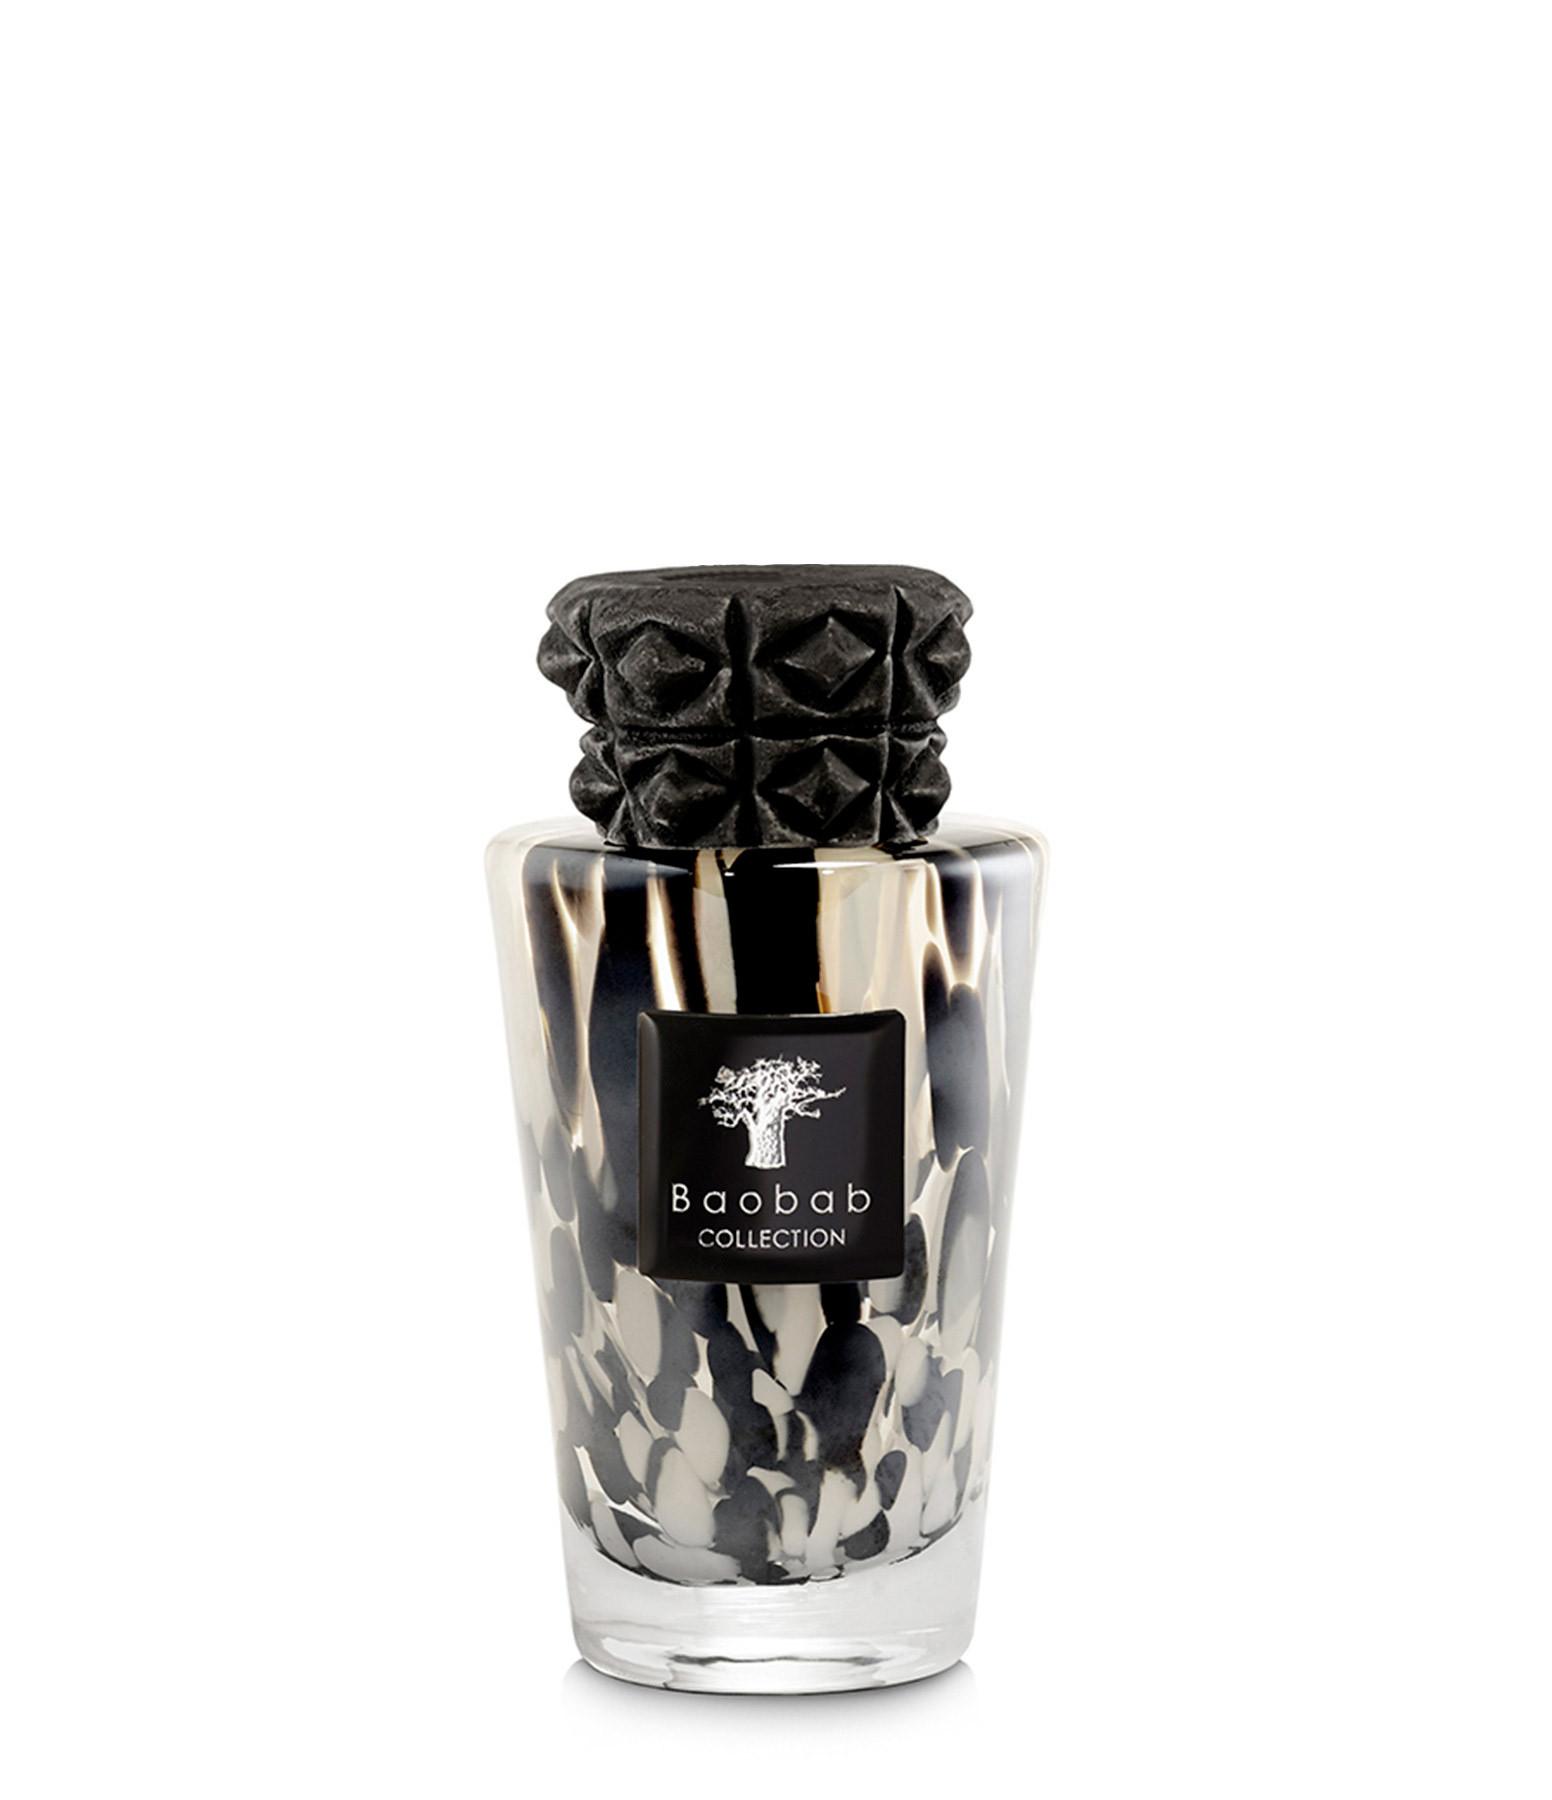 BAOBAB COLLECTION - Totem Mini Diffuseur Black Pearls 250ML